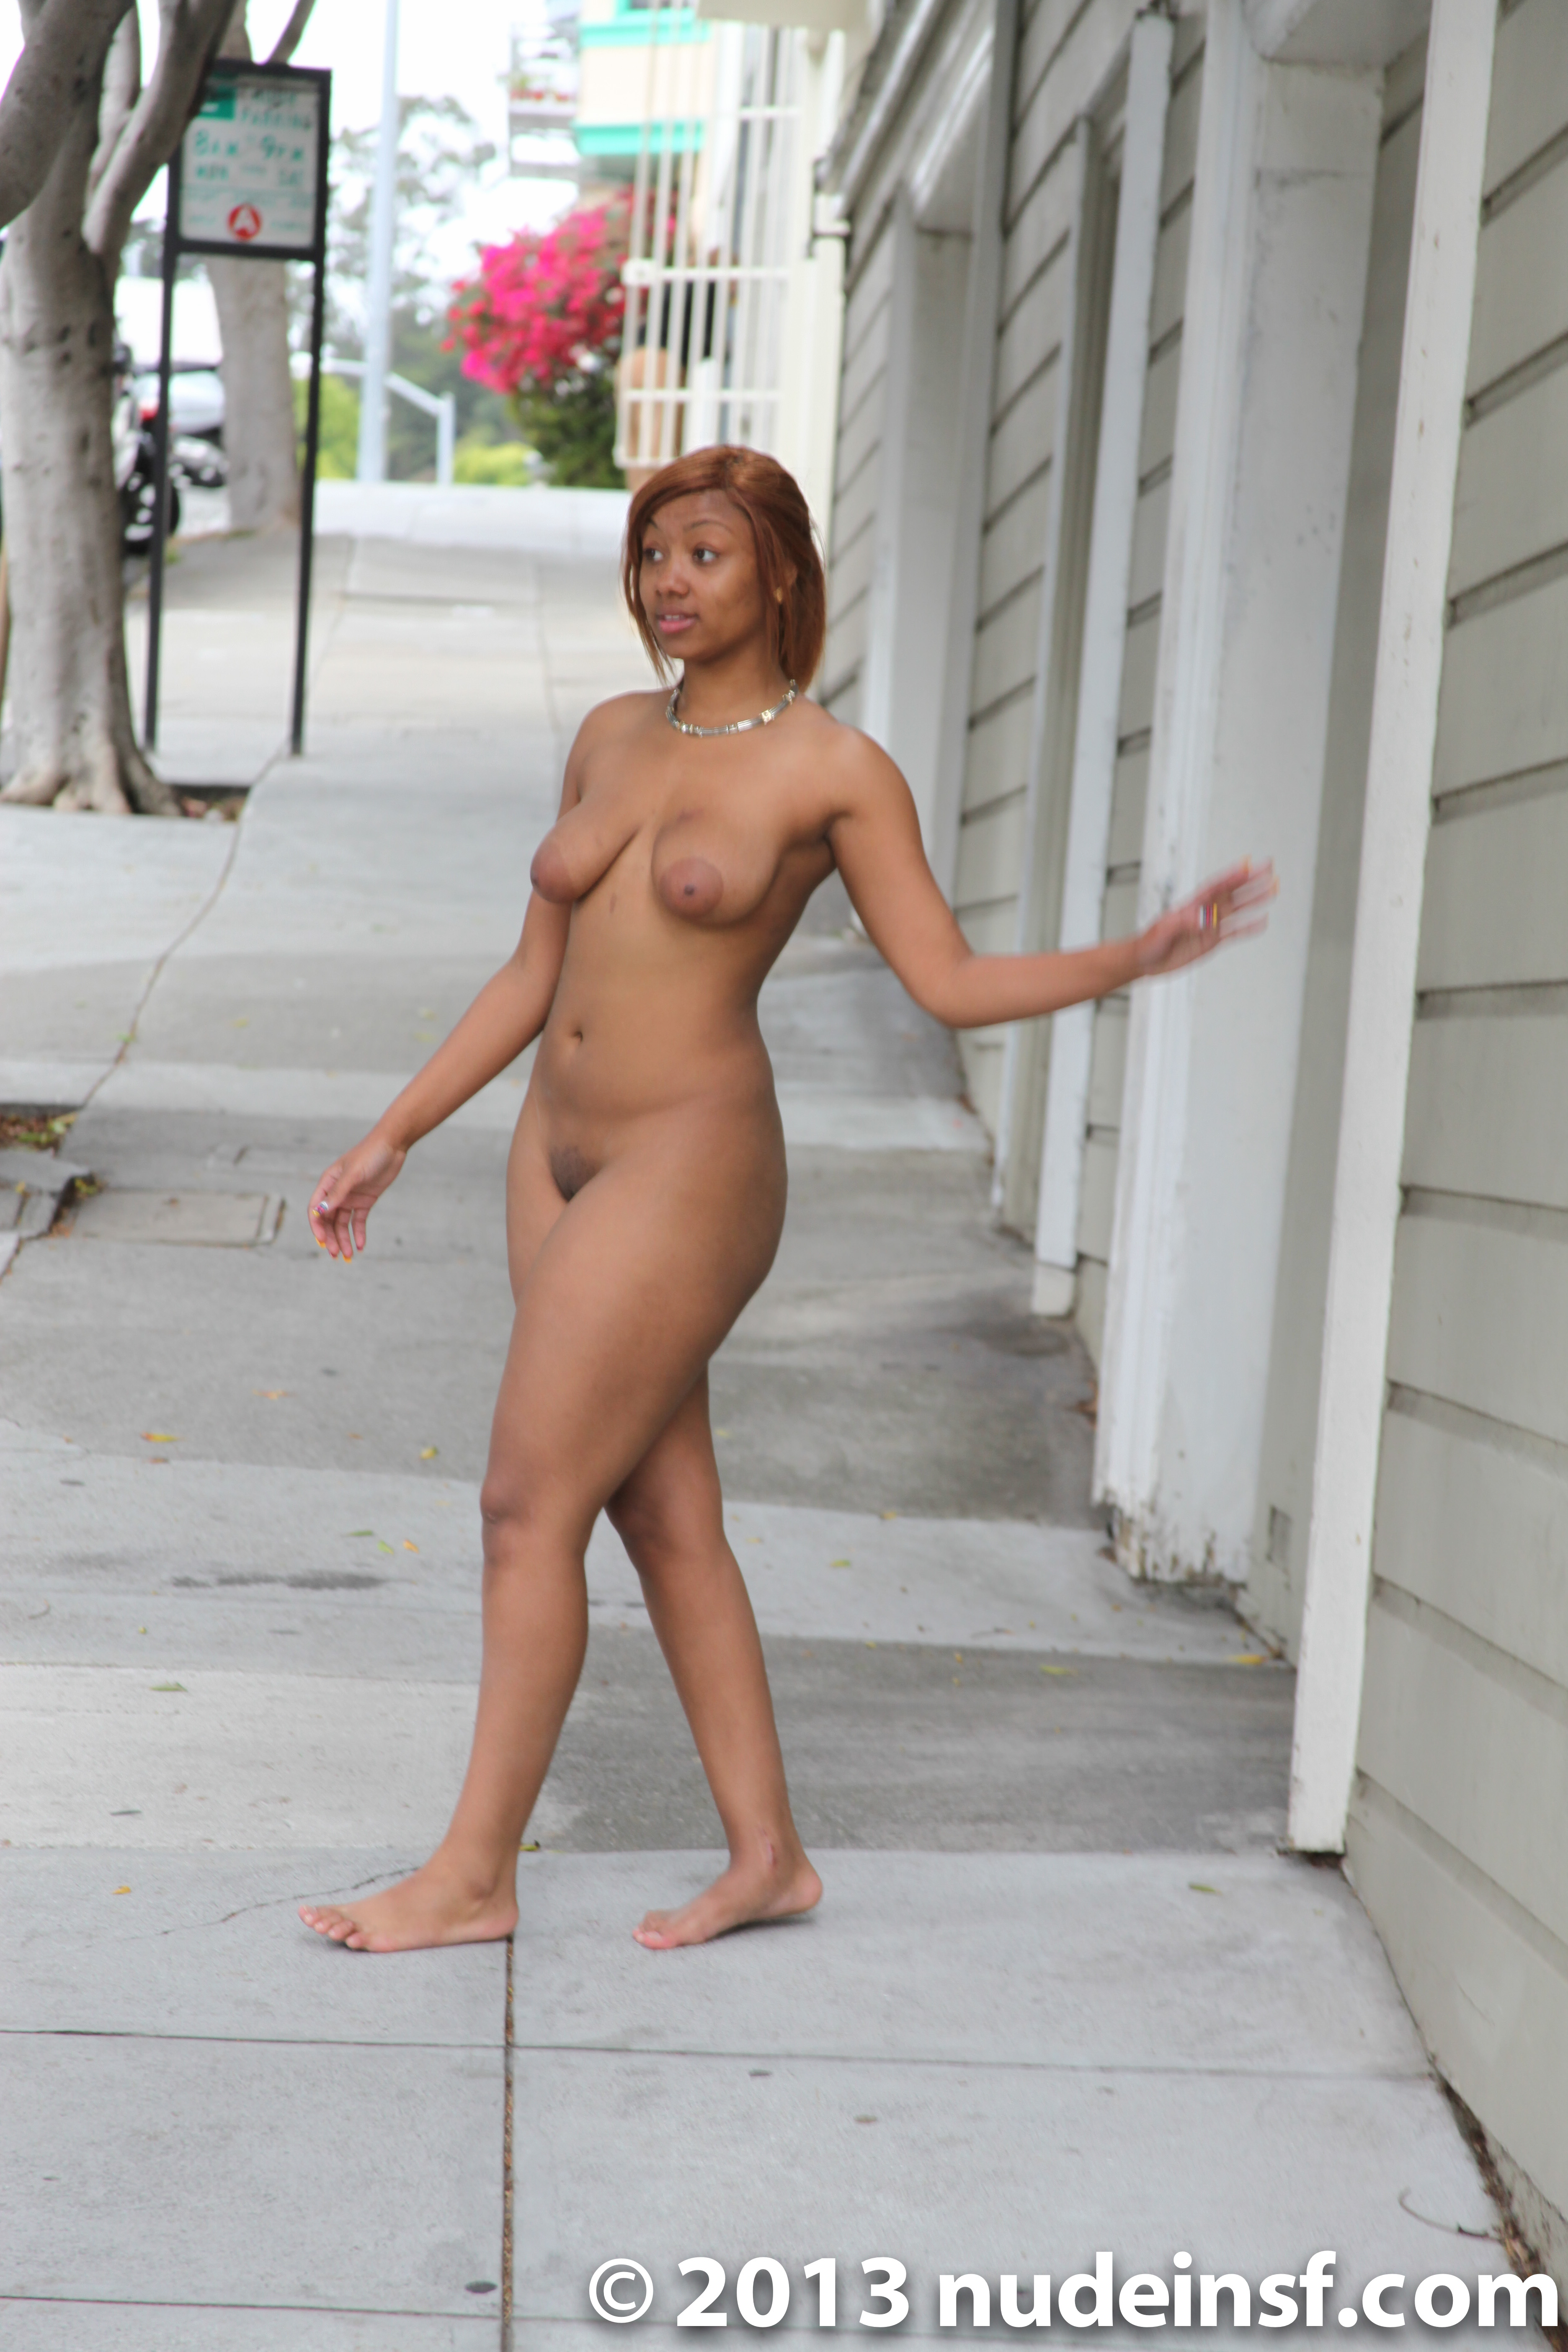 Malaysian girls caught naked